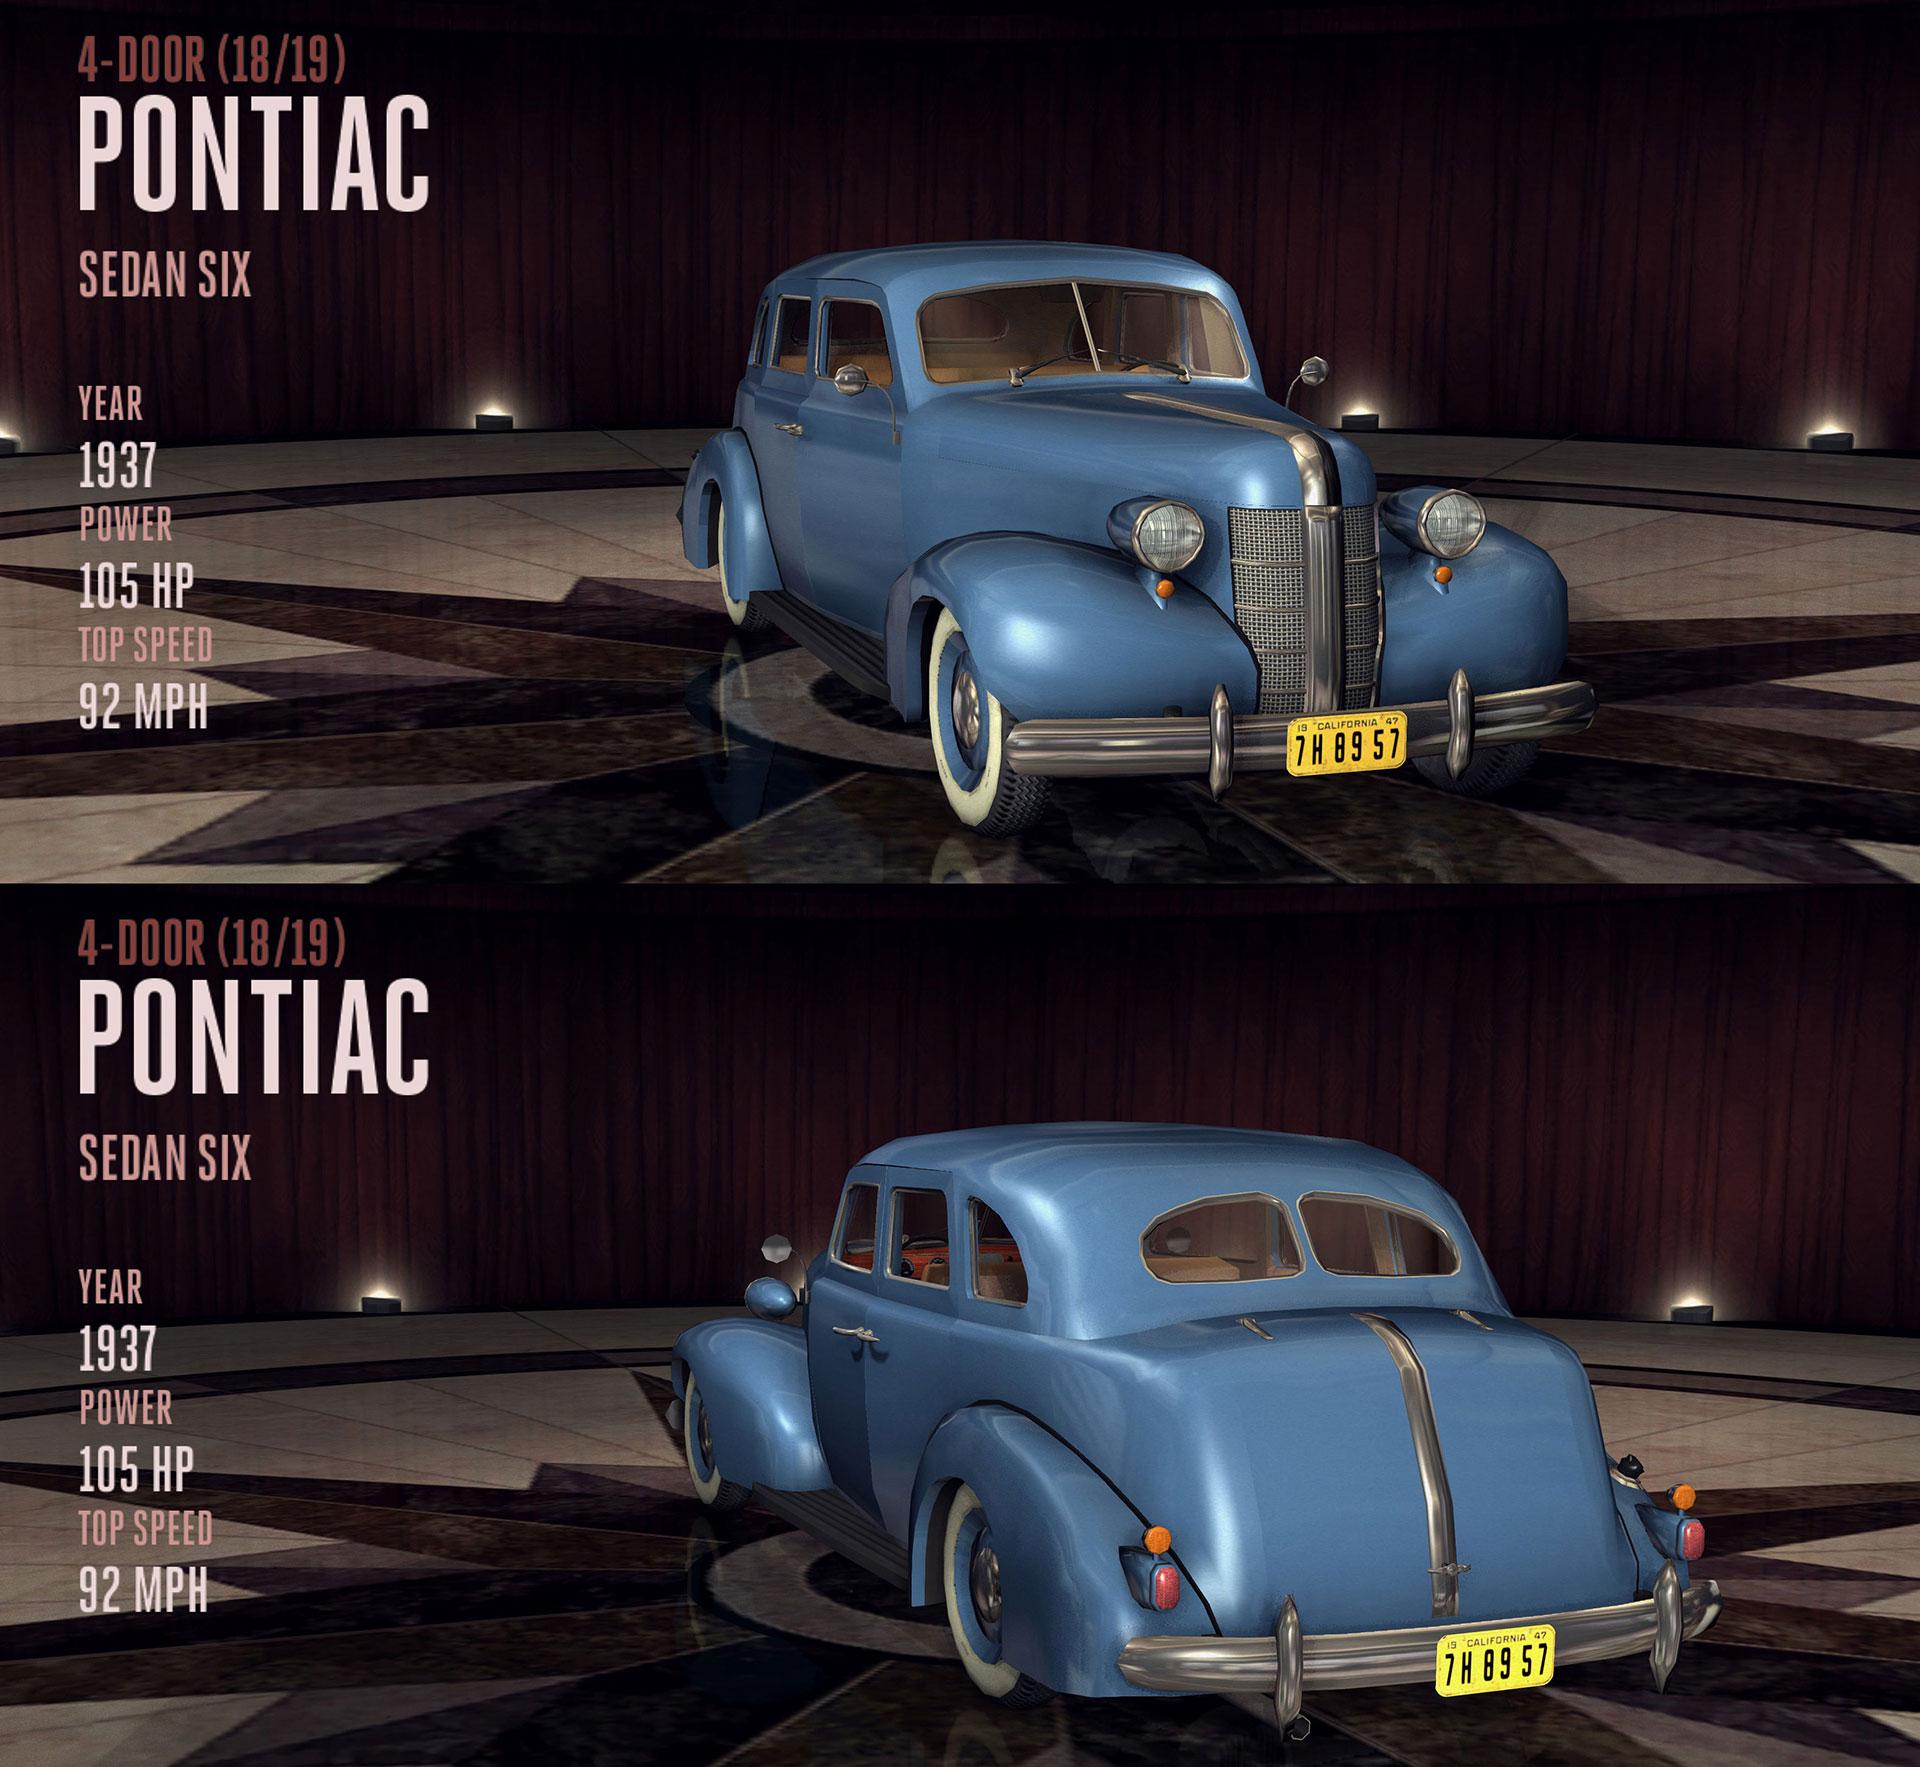 File:1937-pontiac-sedan-six.jpg